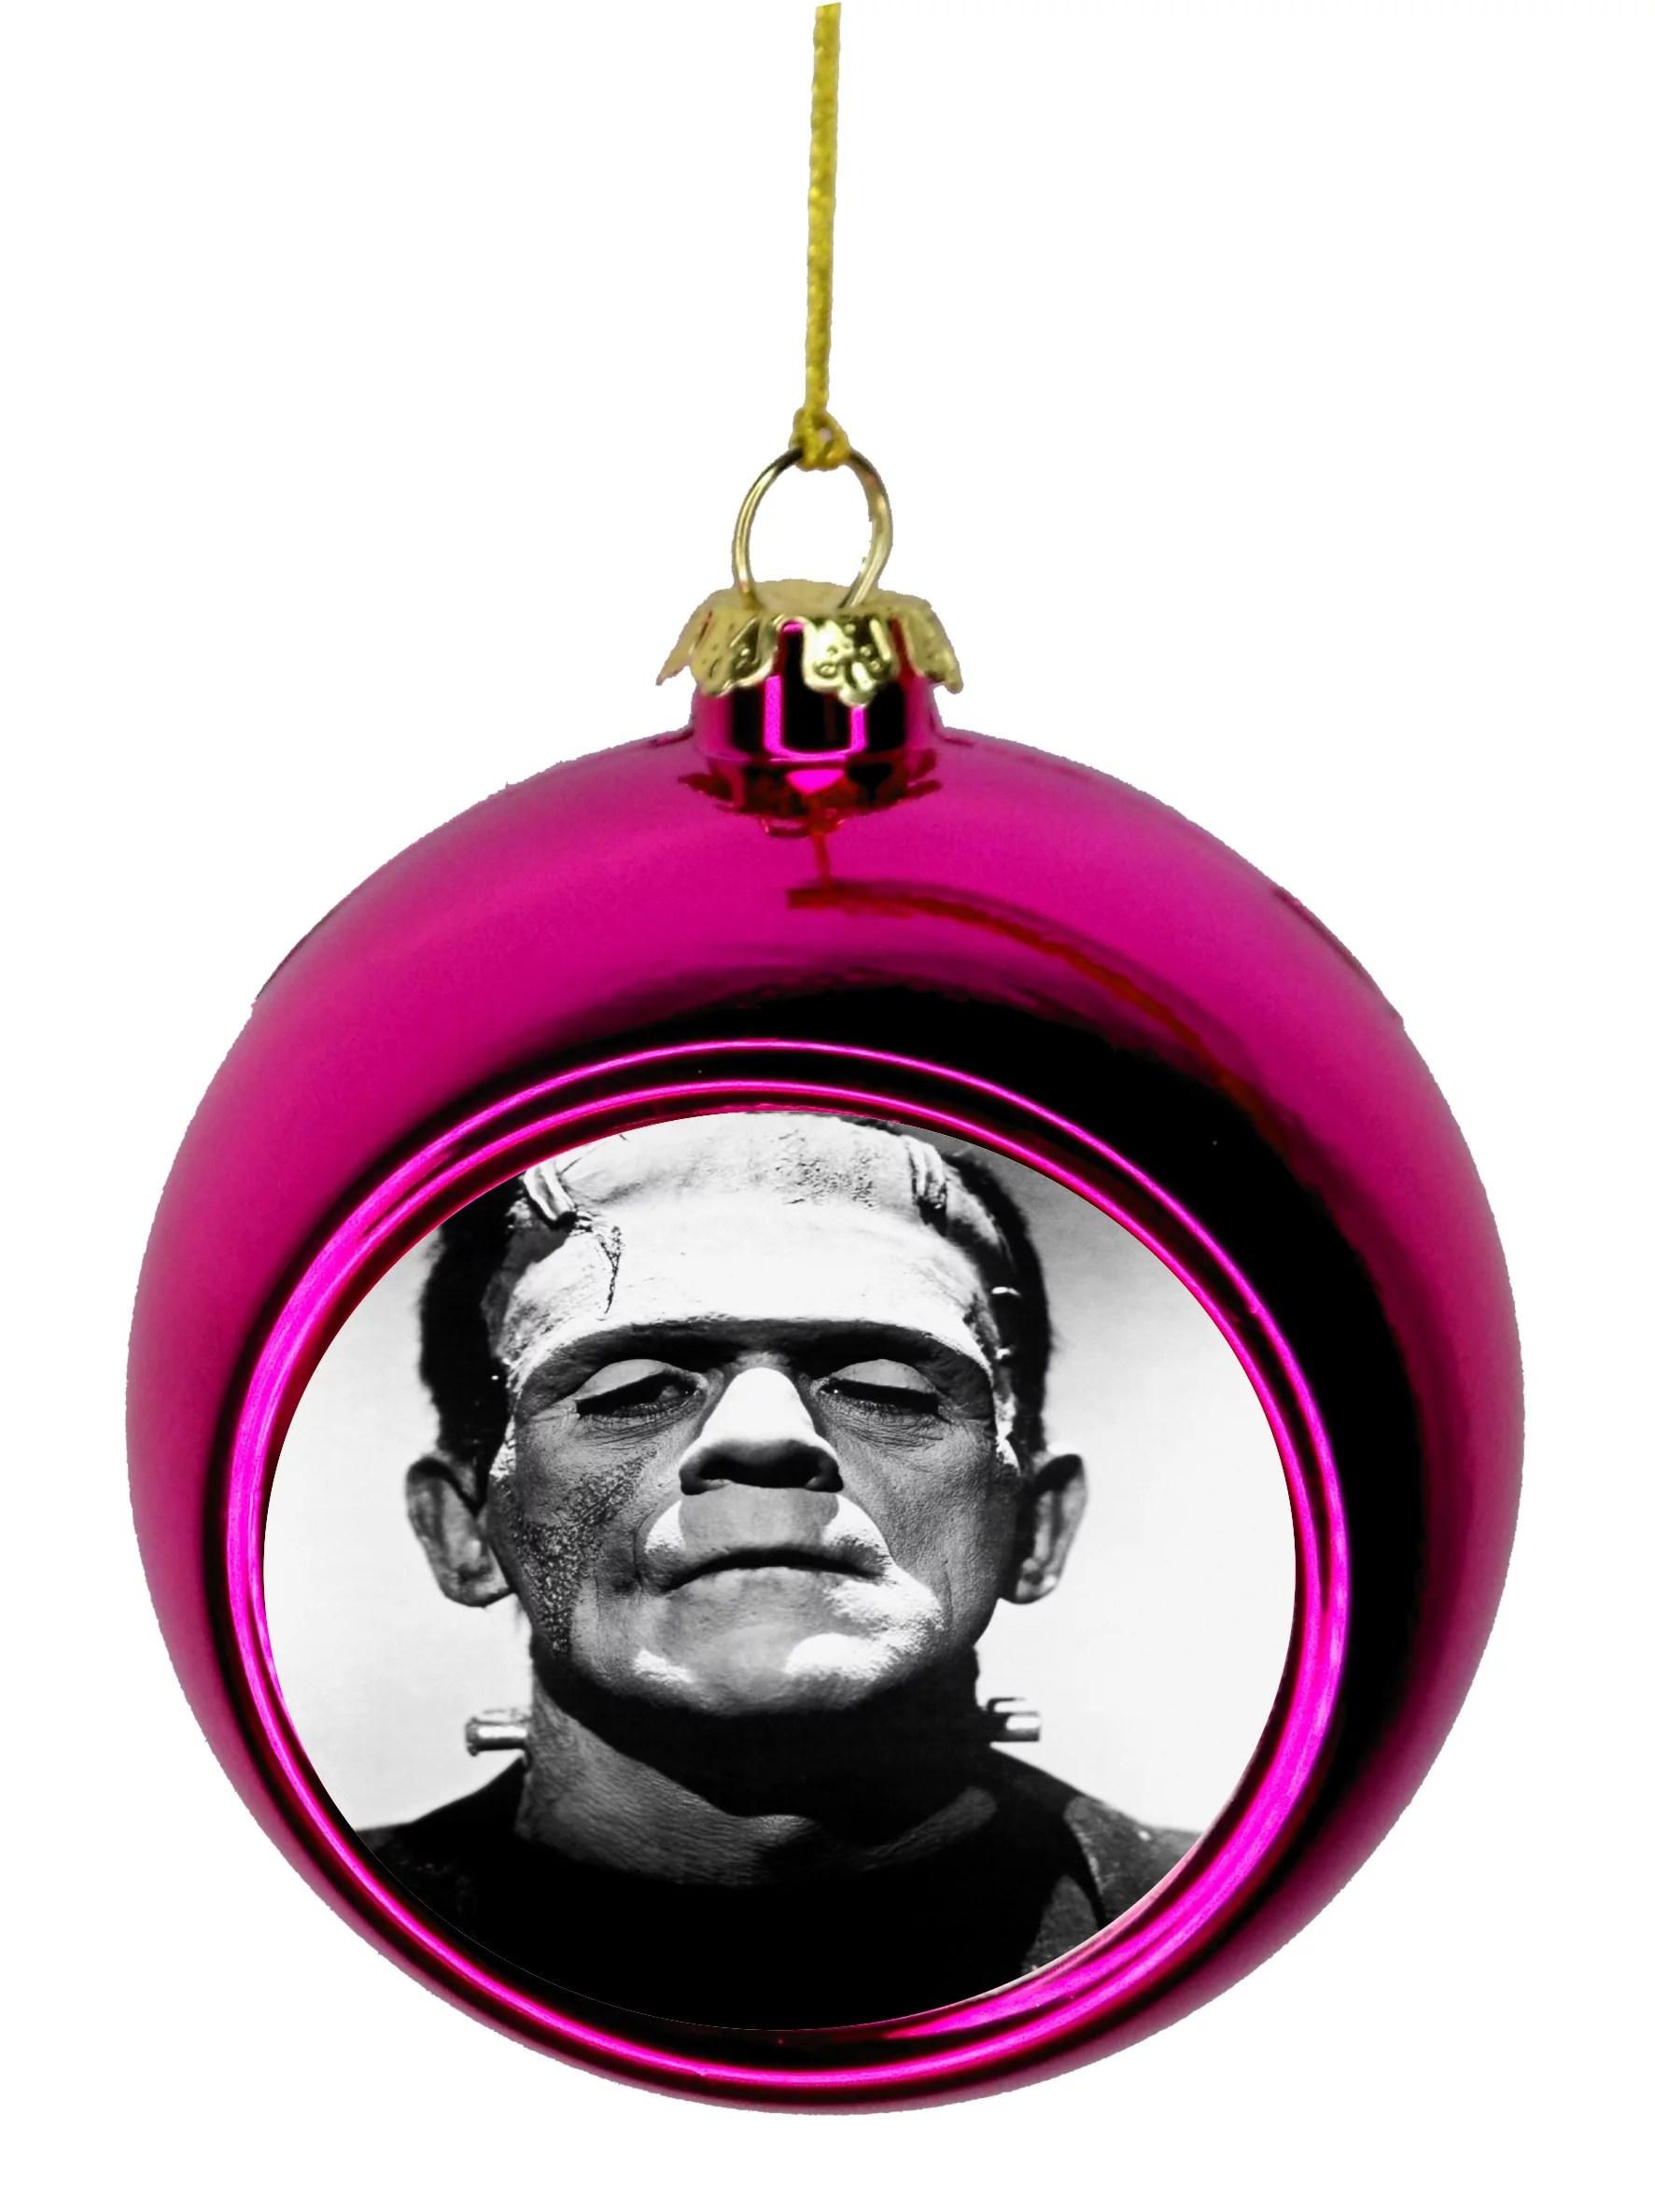 Frankenstein's Monster Bauble Christmas Ornaments Pink ...